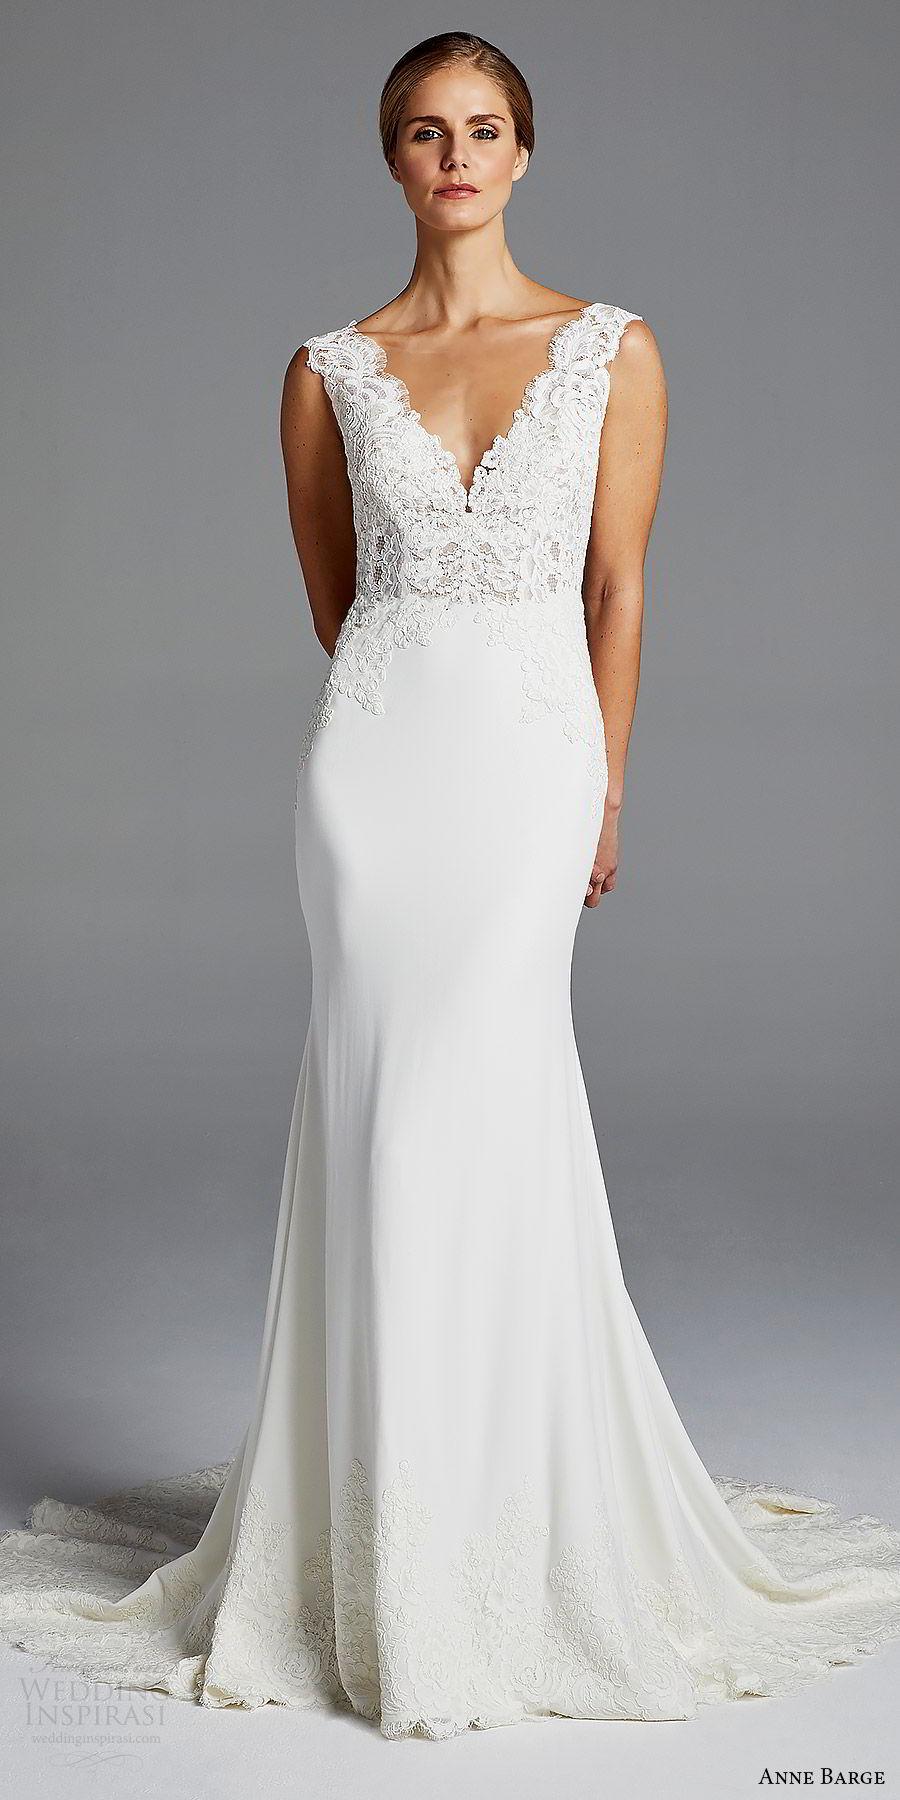 Anne Barge Spring 2019 Wedding Dresses Wedding Inspirasi